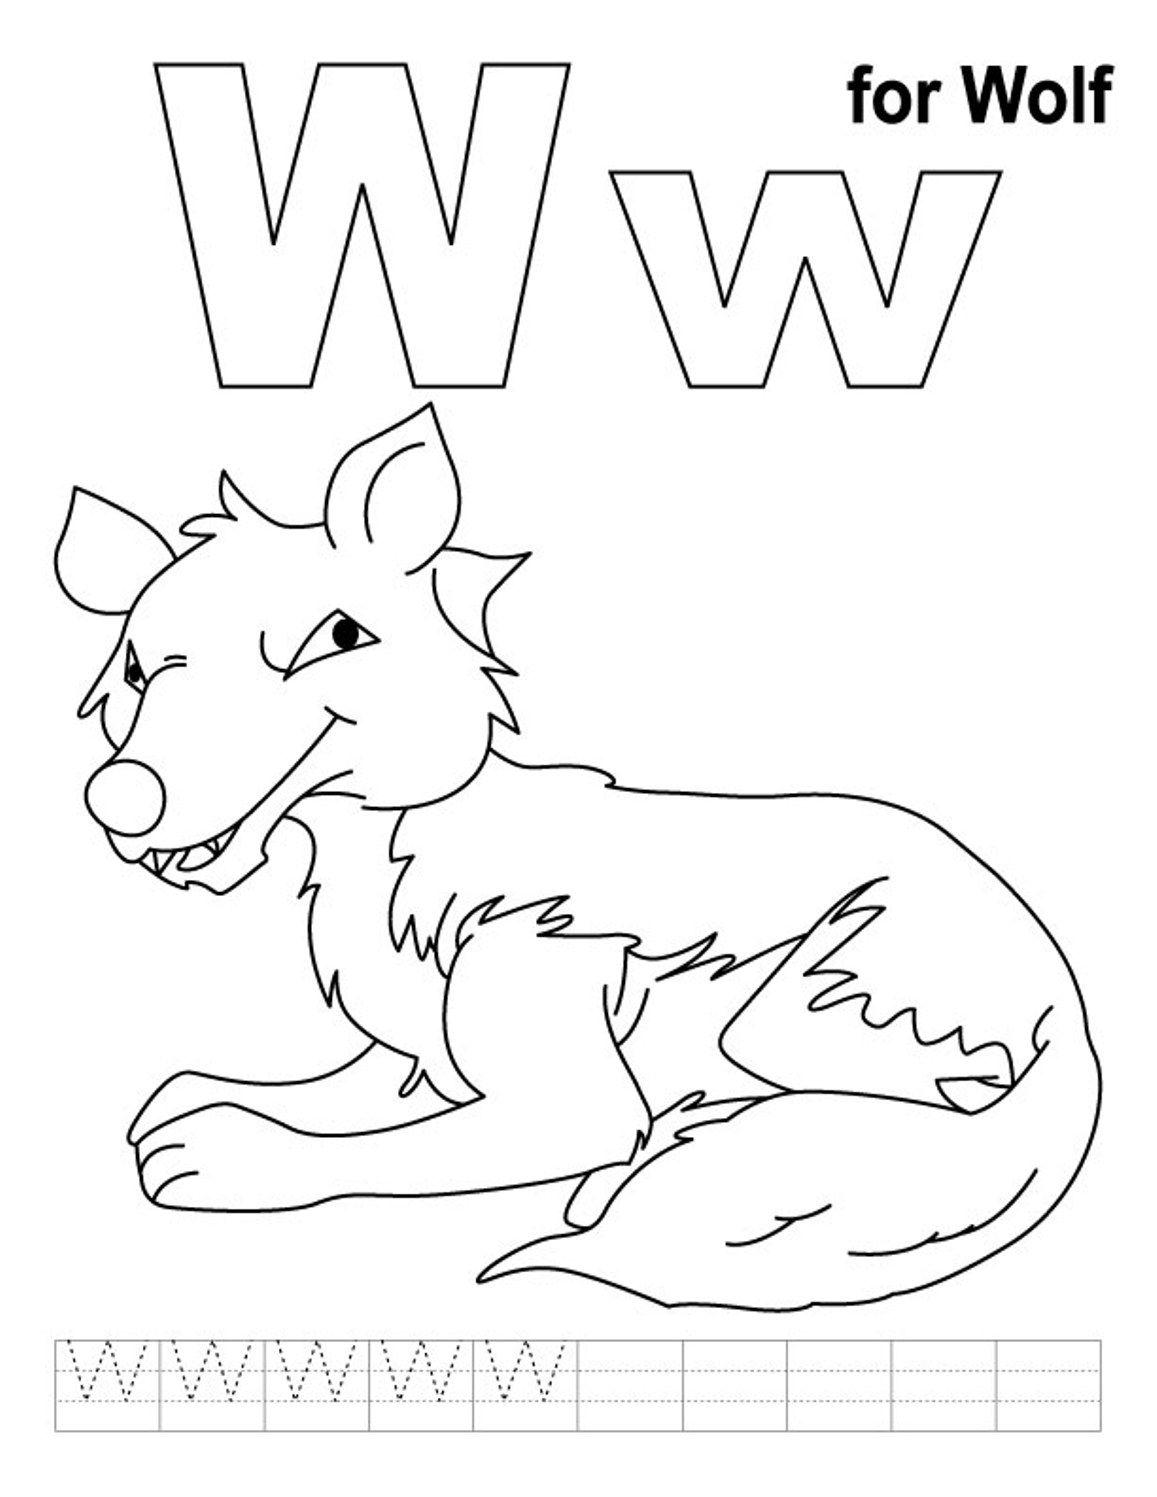 Wolf Free Alphabet Coloring Pages | ABC | Pinterest | Schule